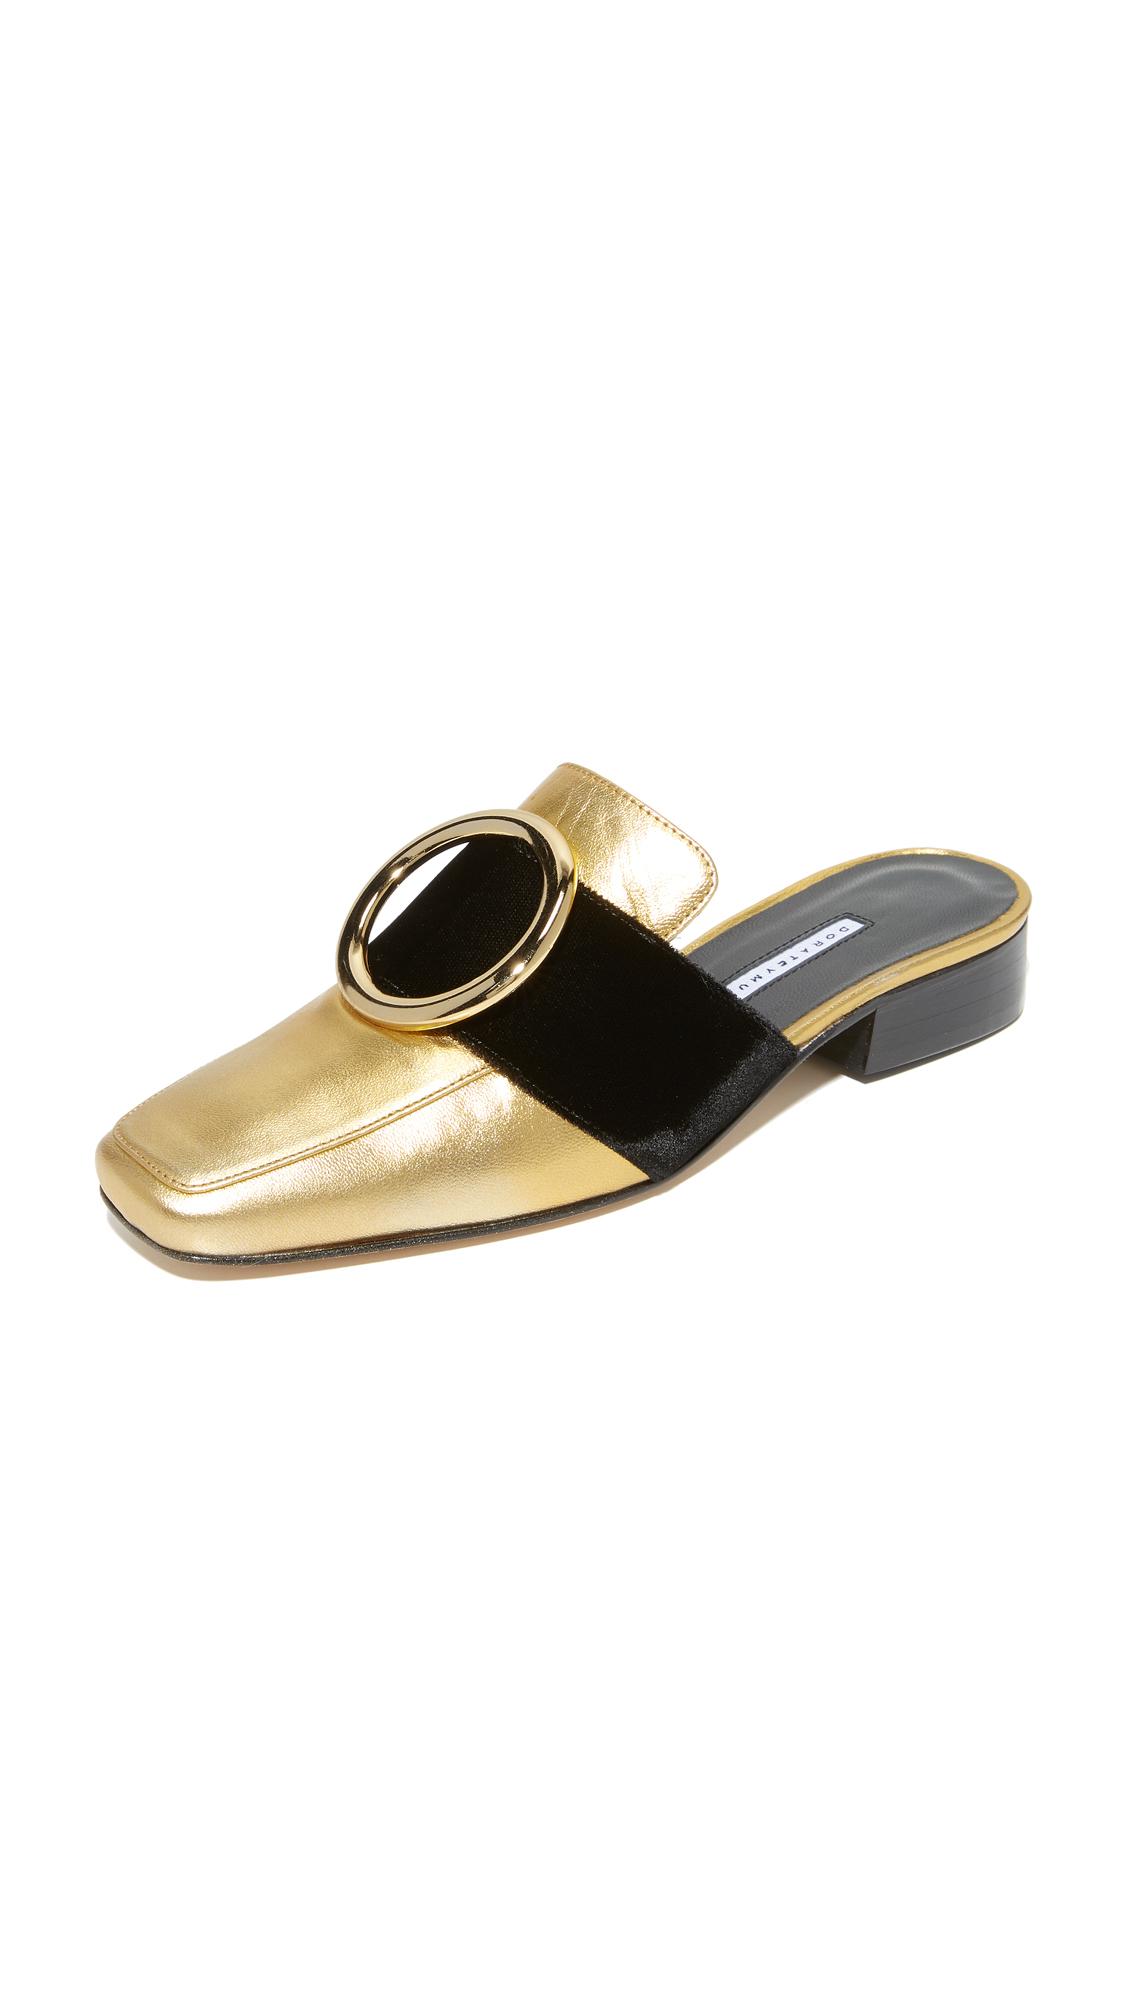 Dorateymur Petrol Mule Slides - Gold/Black